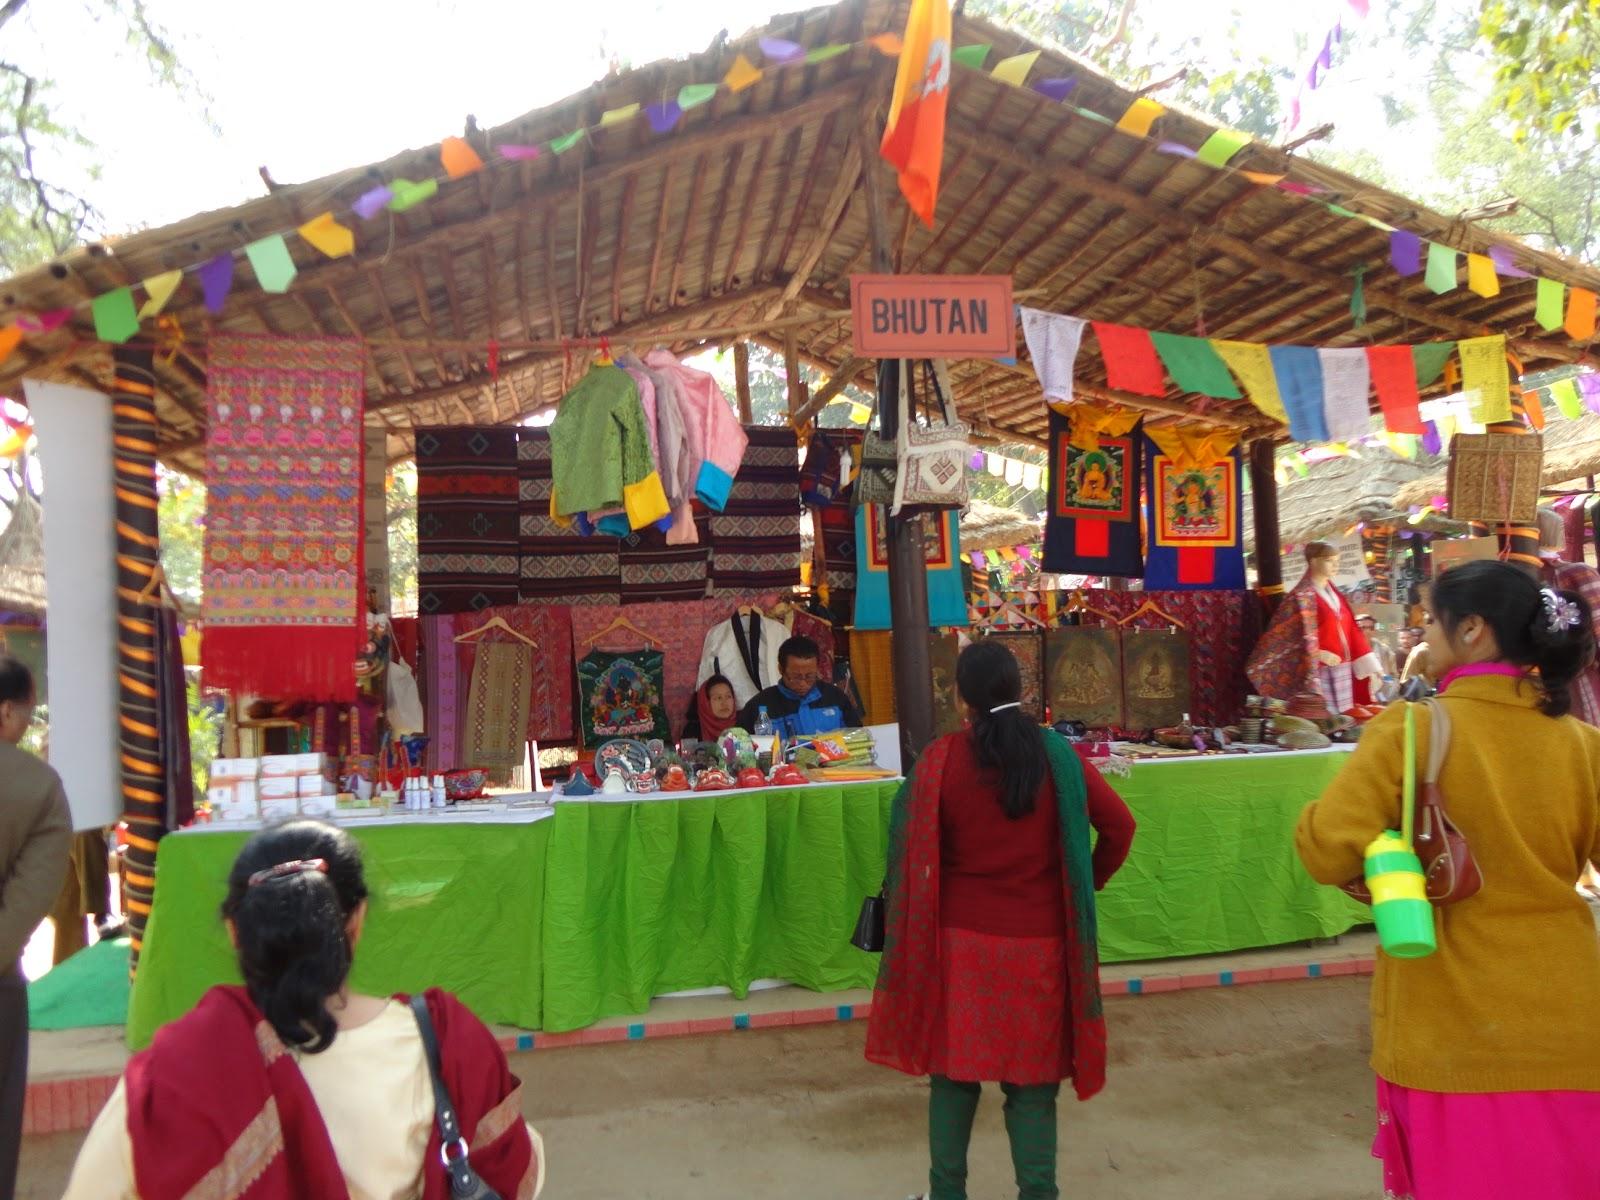 The Bhutan Stall at Surajkund Crafts Mela, India